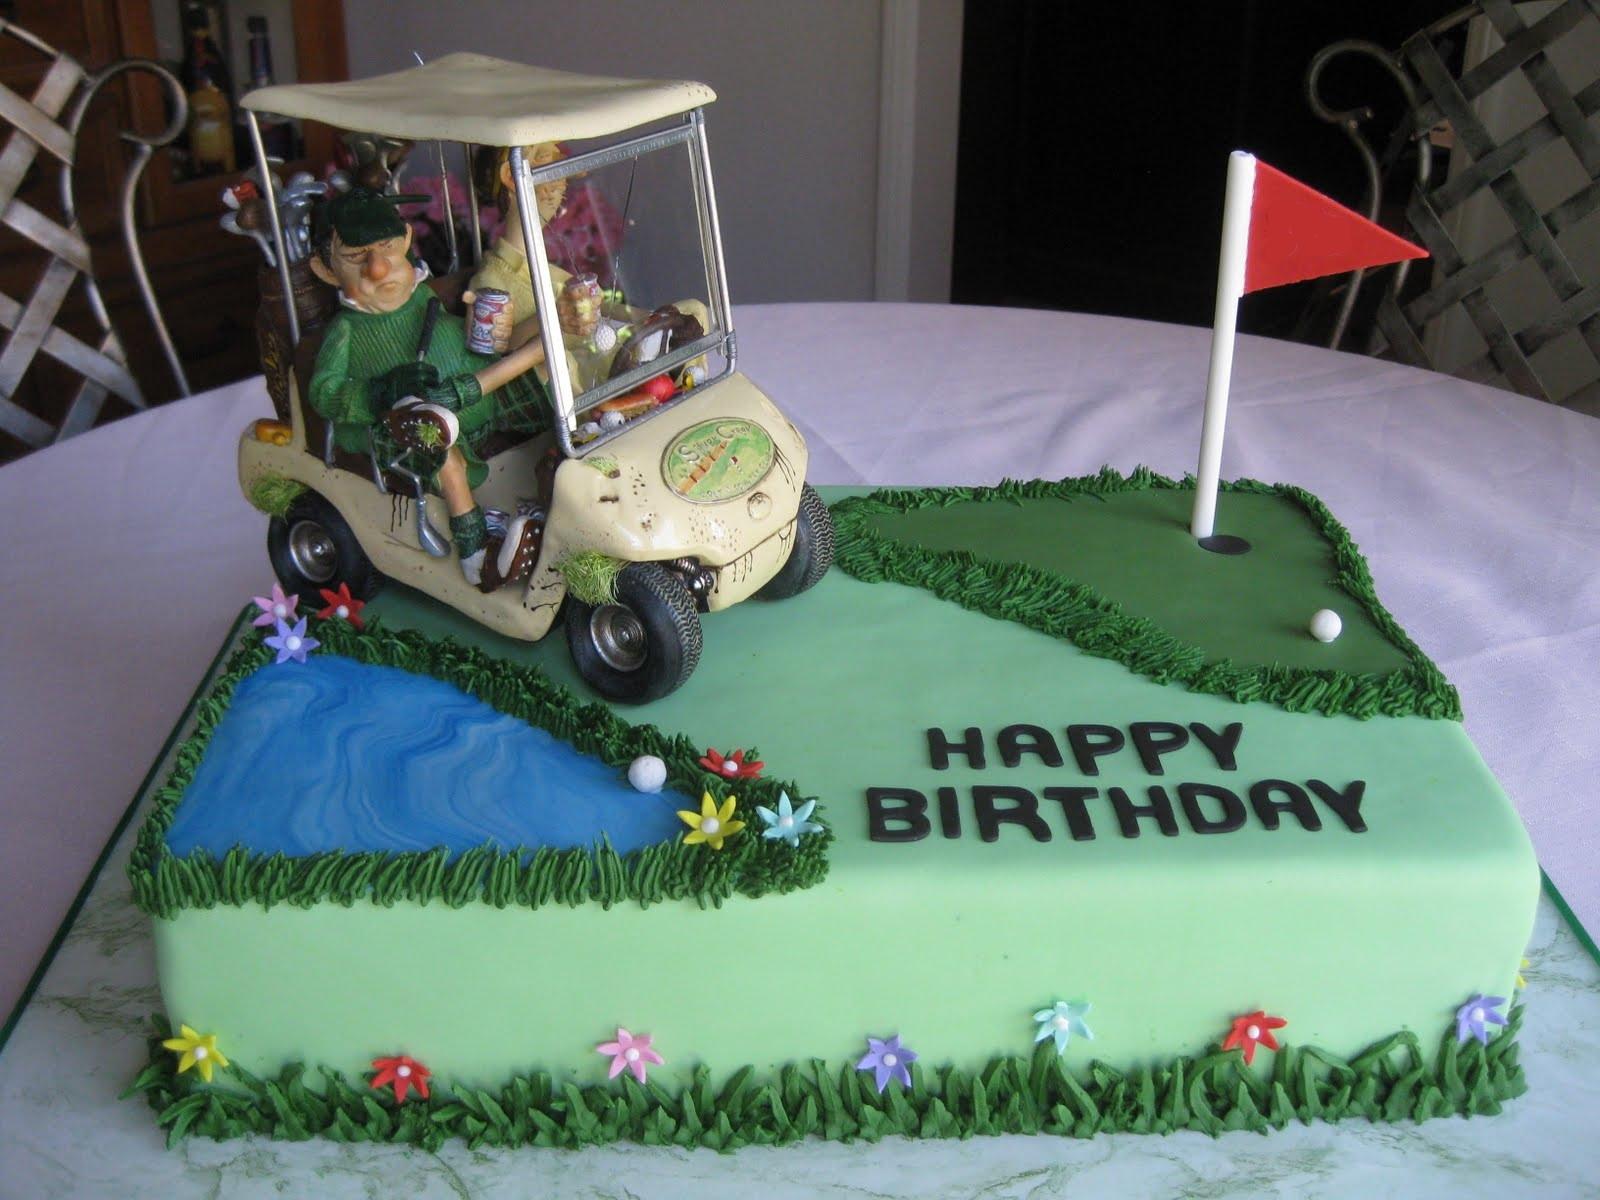 Happy Birthday SteveO